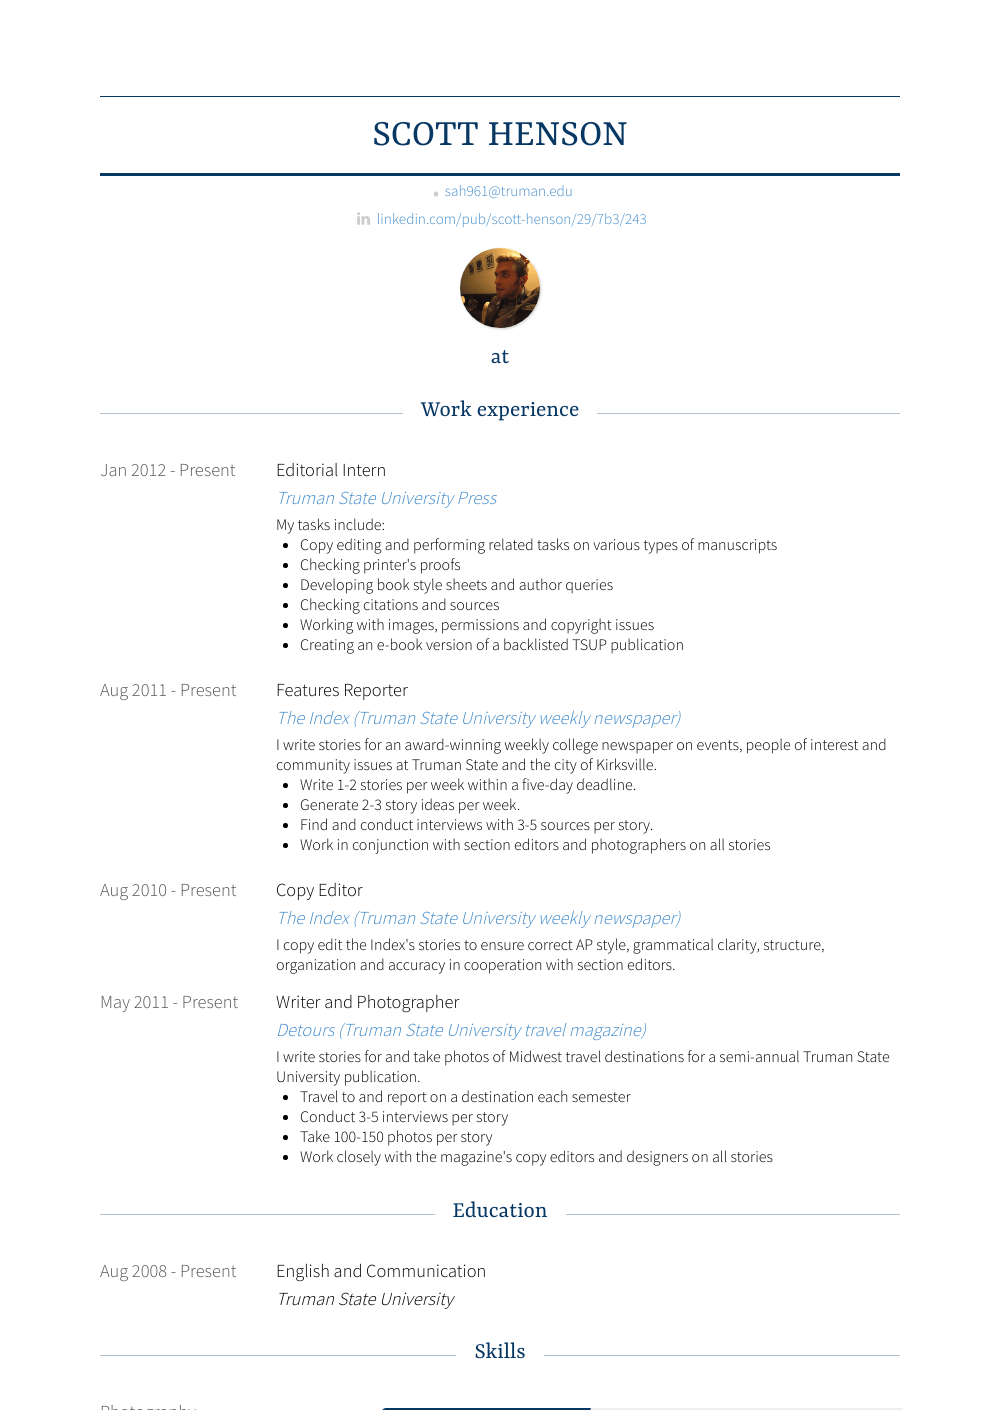 Editorial Intern - Resume Samples & Templates | VisualCV